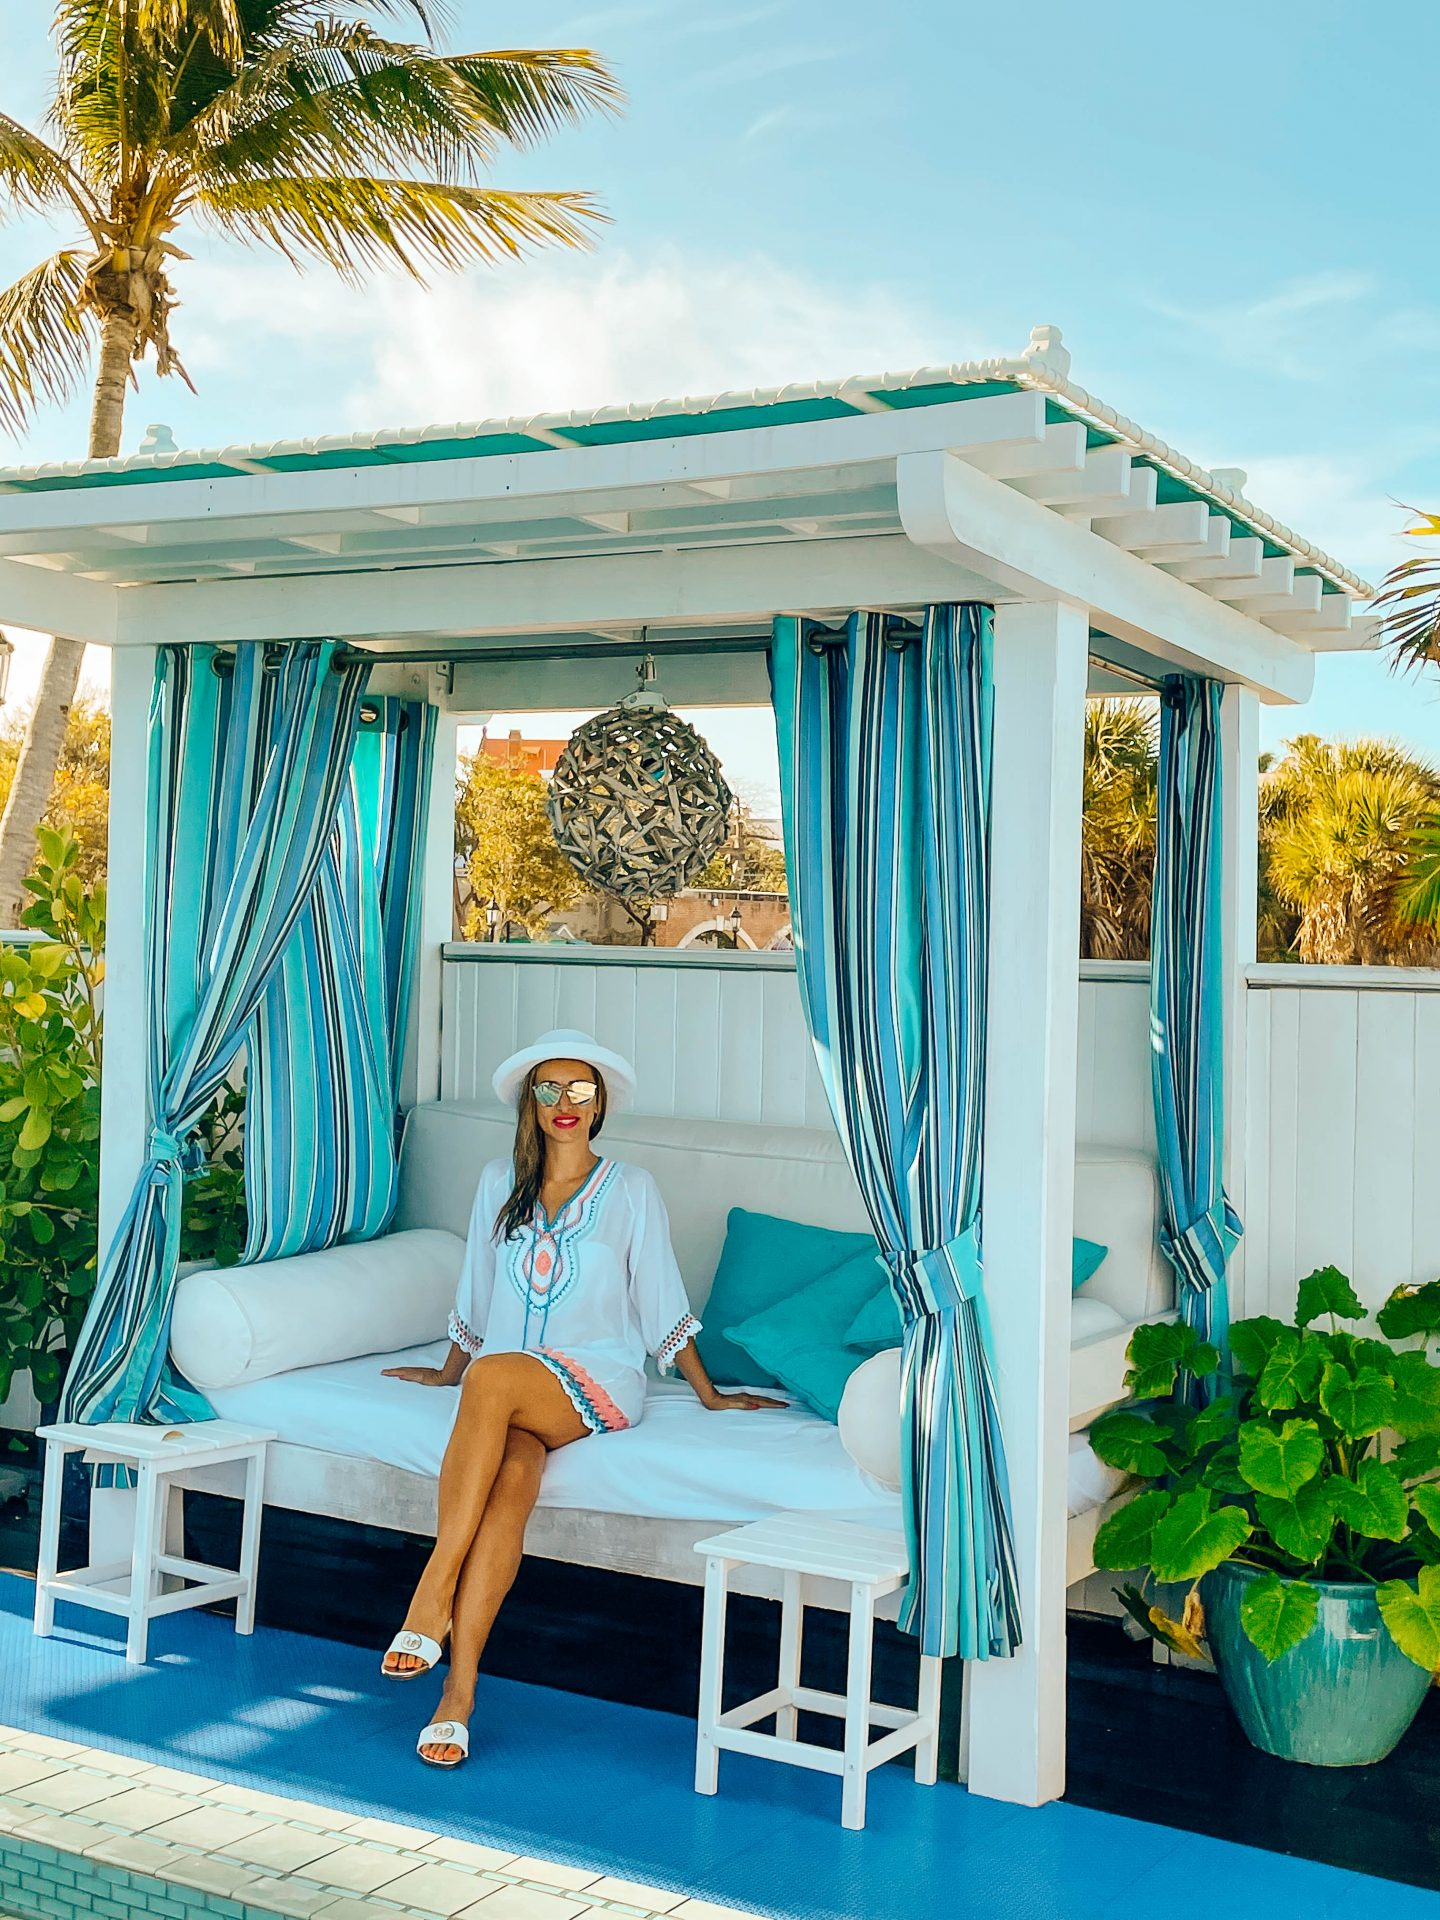 Trip to Key West with Ocean Key Resort & Spa